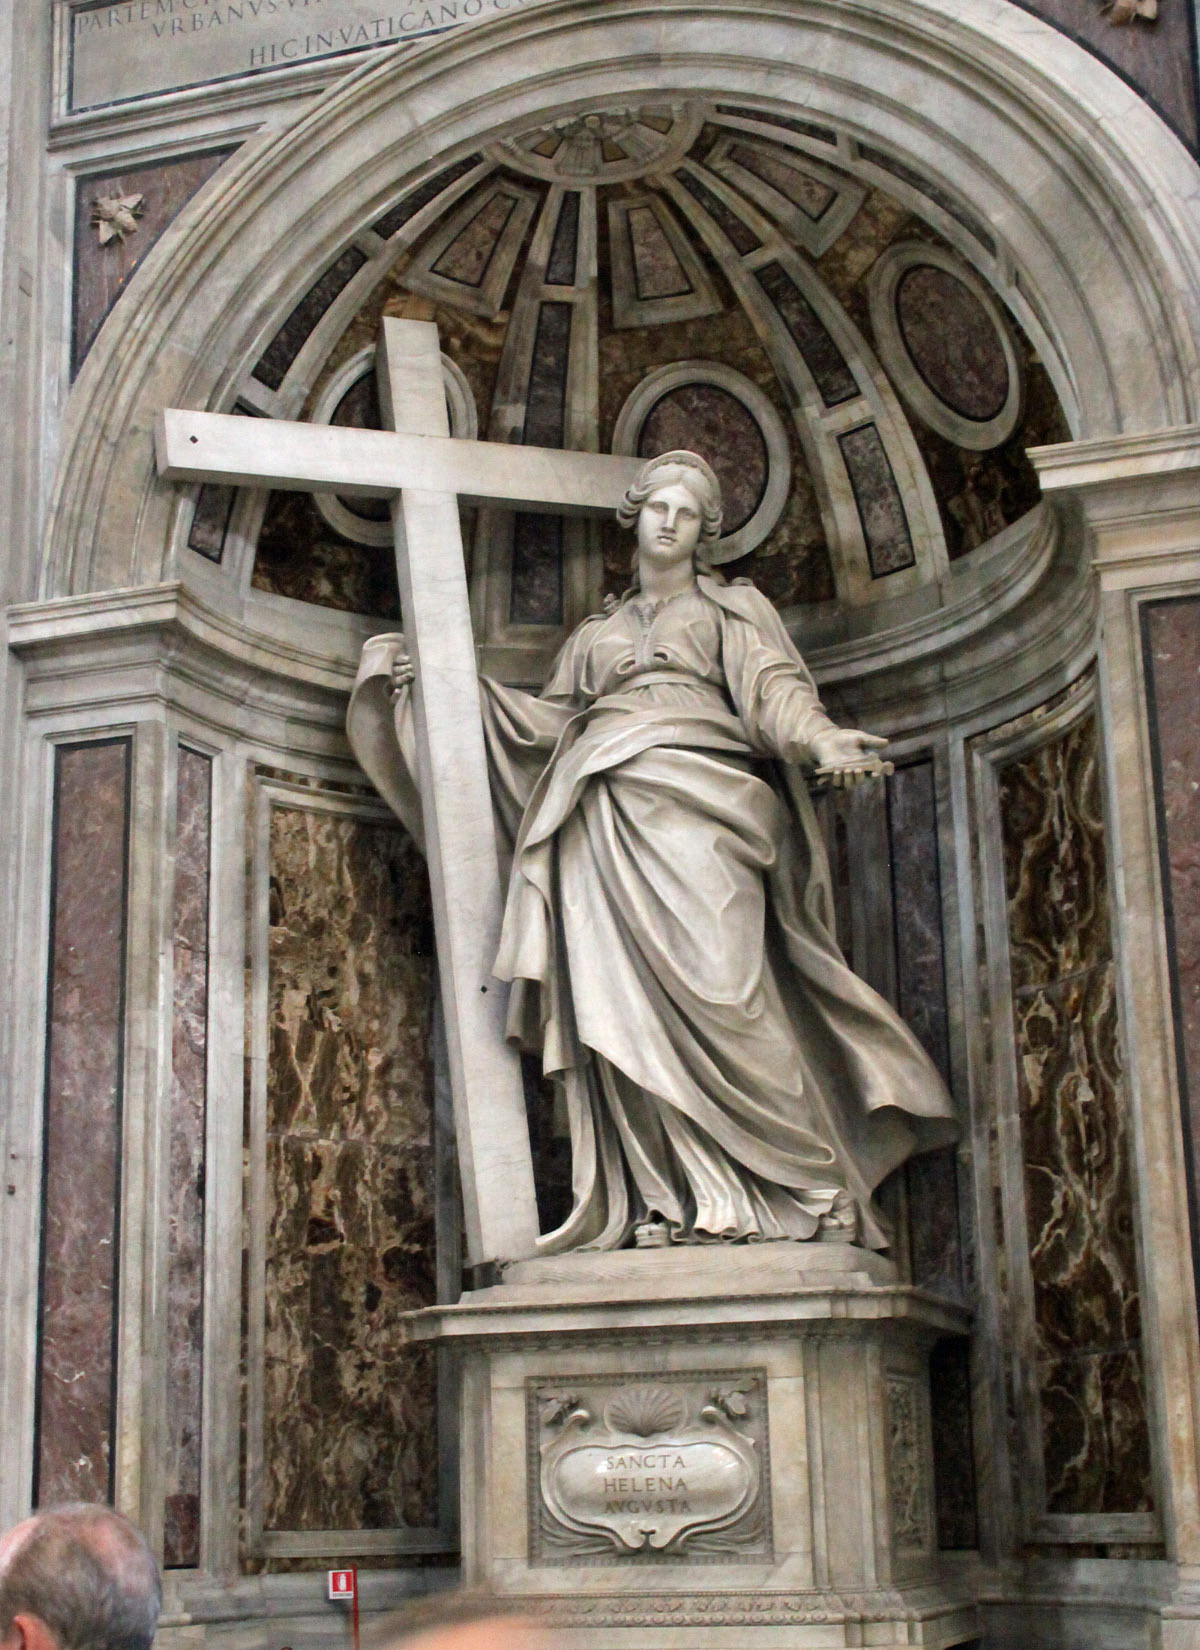 St. Peter's Basilica - Statue